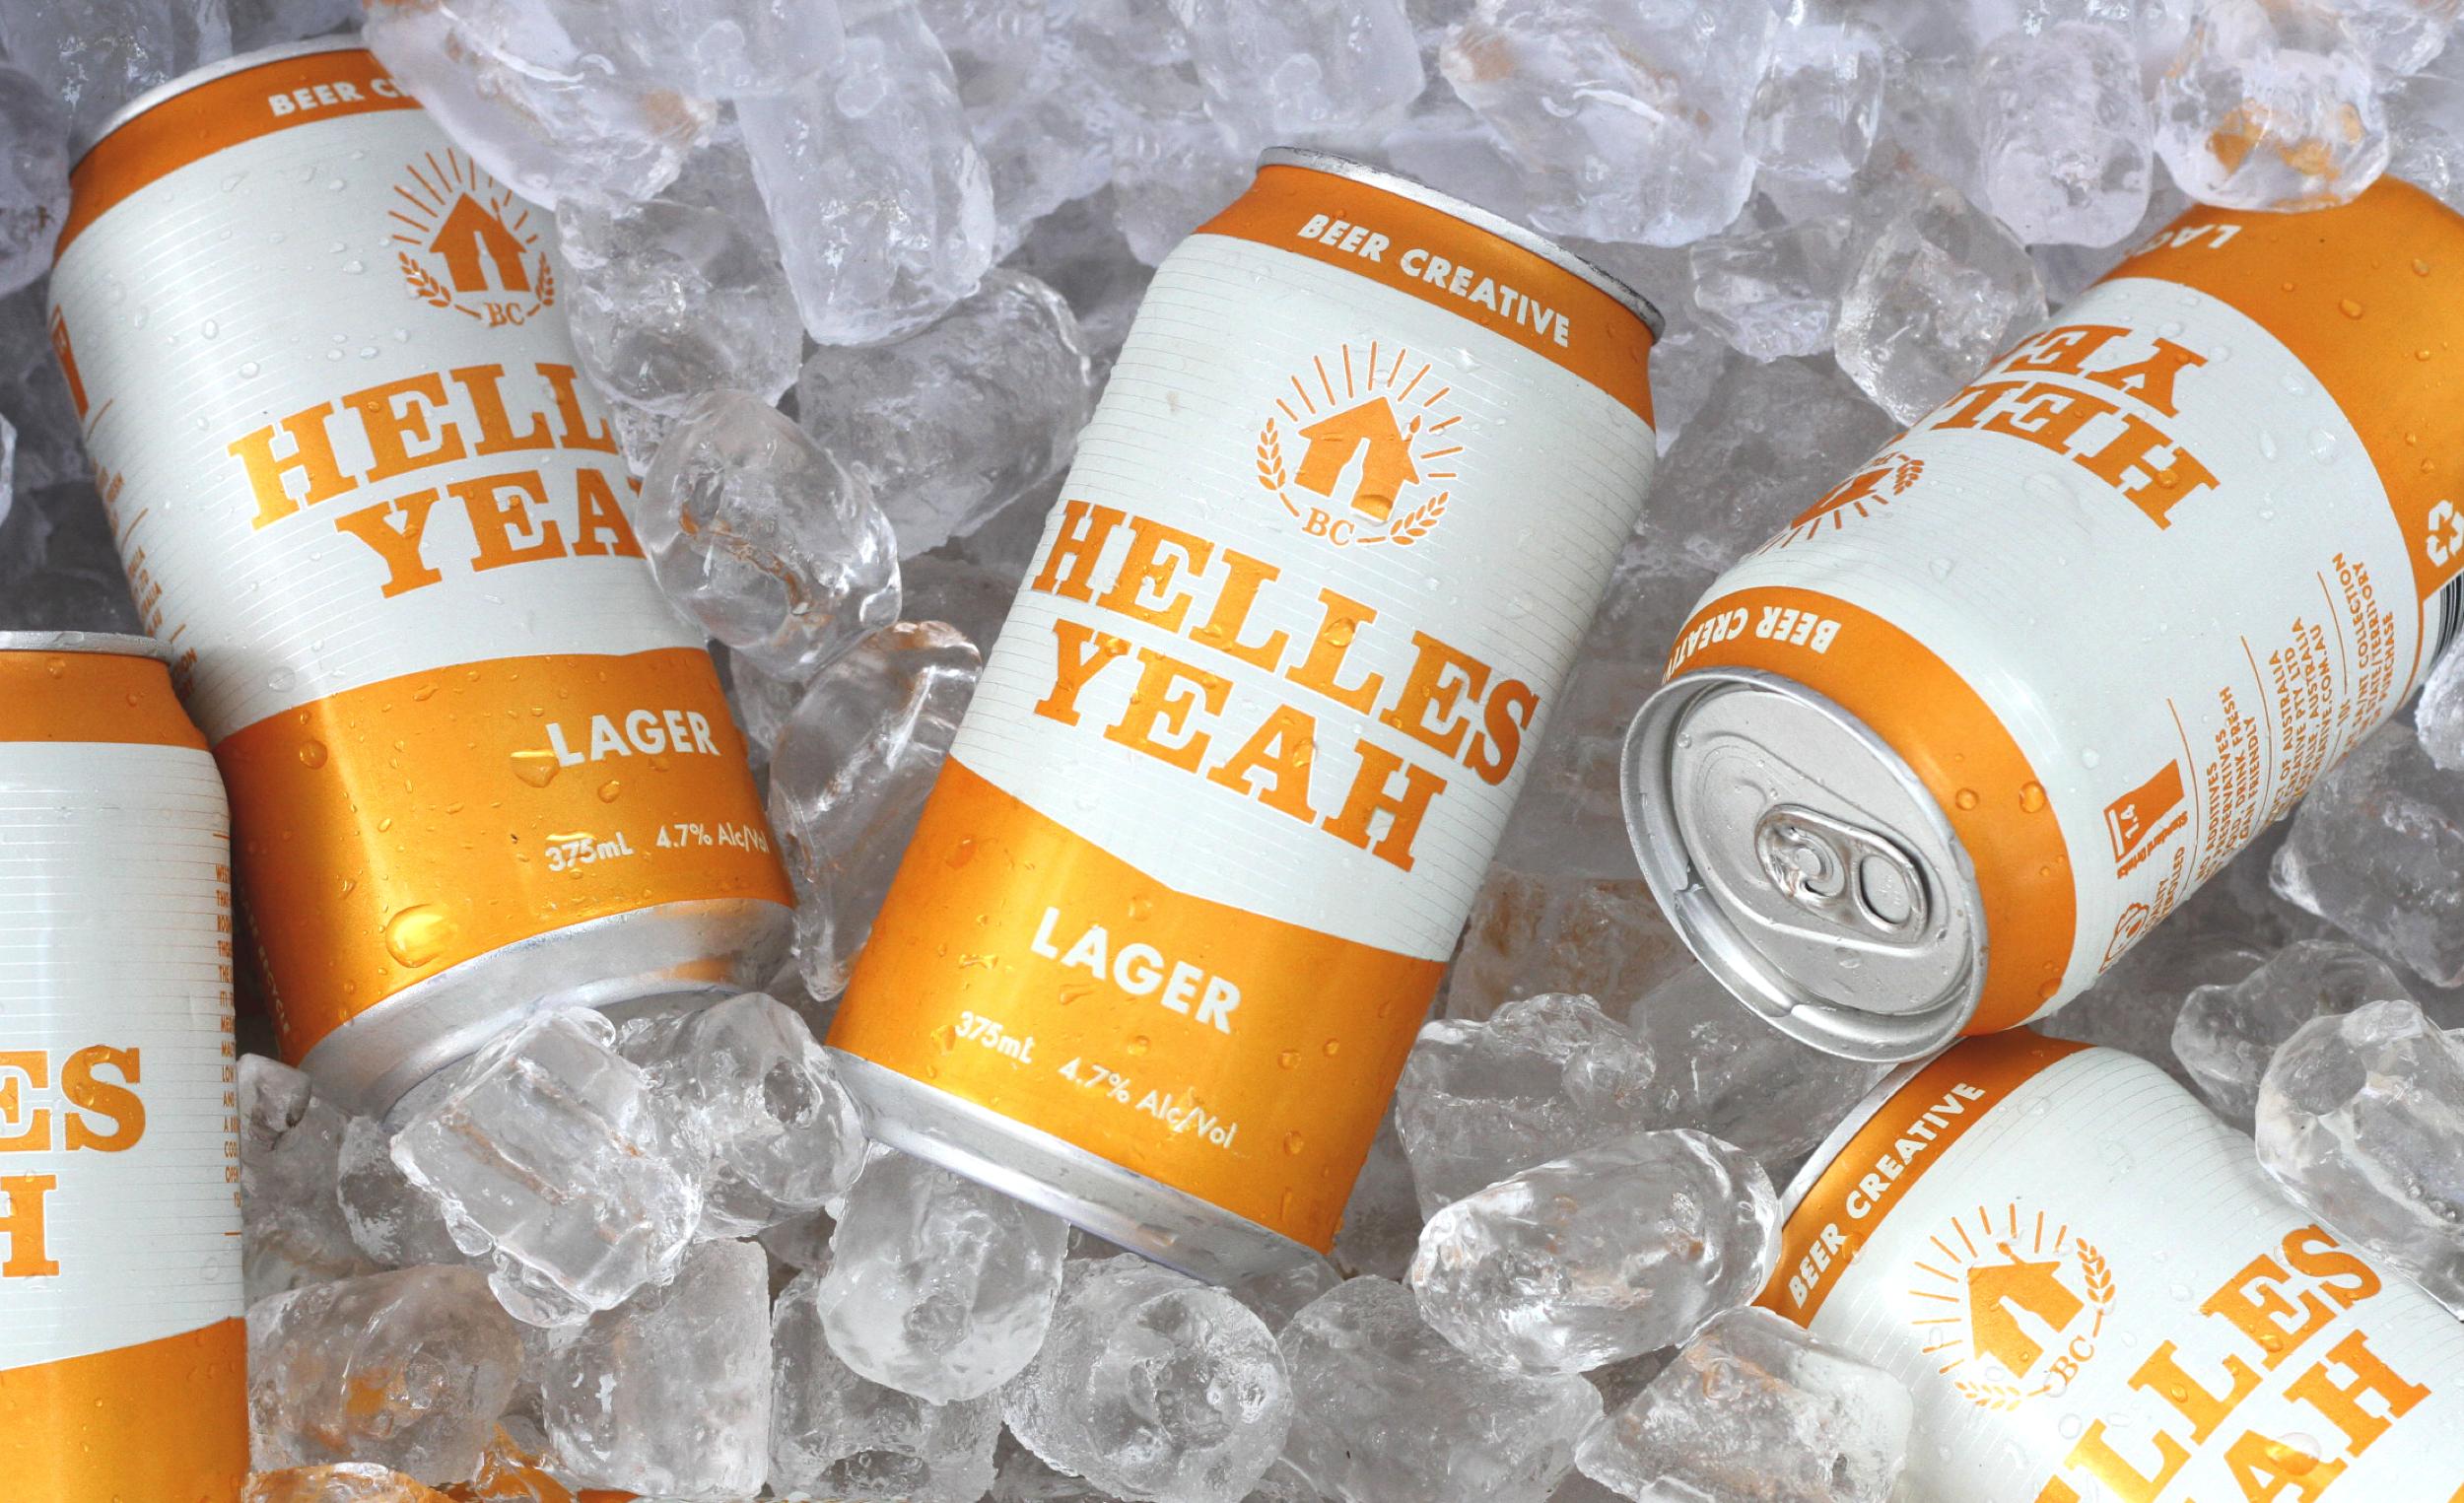 BeerCreative_Helles Yeah - Esky - V1.png